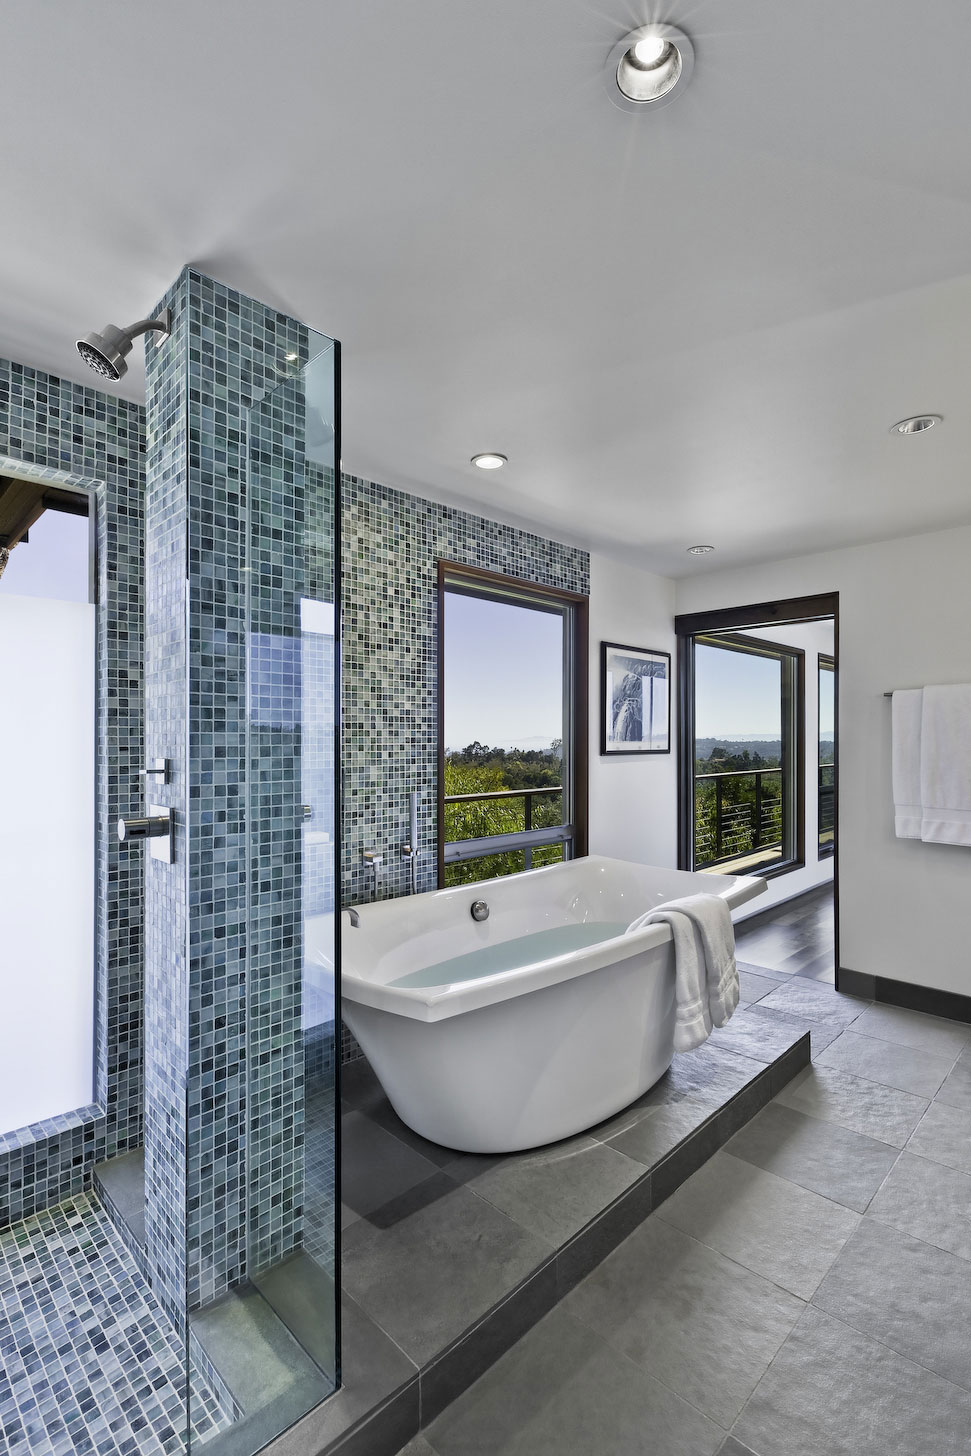 Shower, Bath, Bathroom, Mid-Century Modern Home in Santa Barbara, California